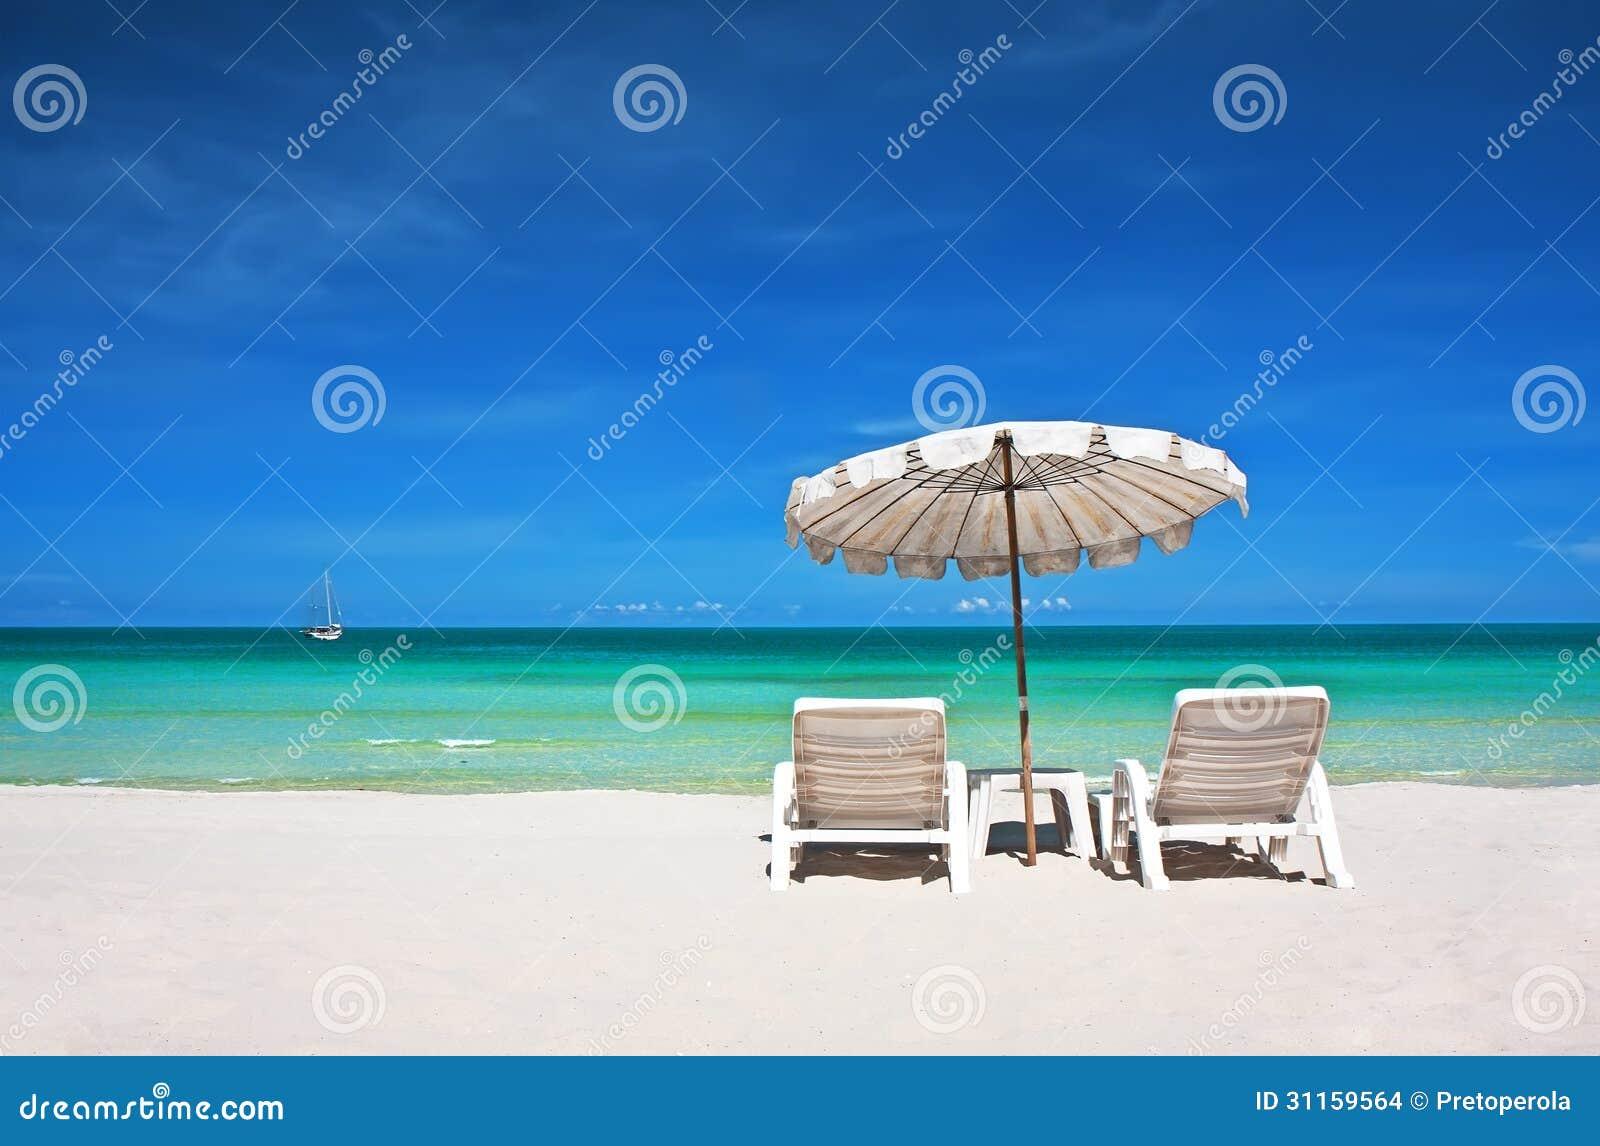 Beach chair with umbrella - Beach Chairs With Umbrella